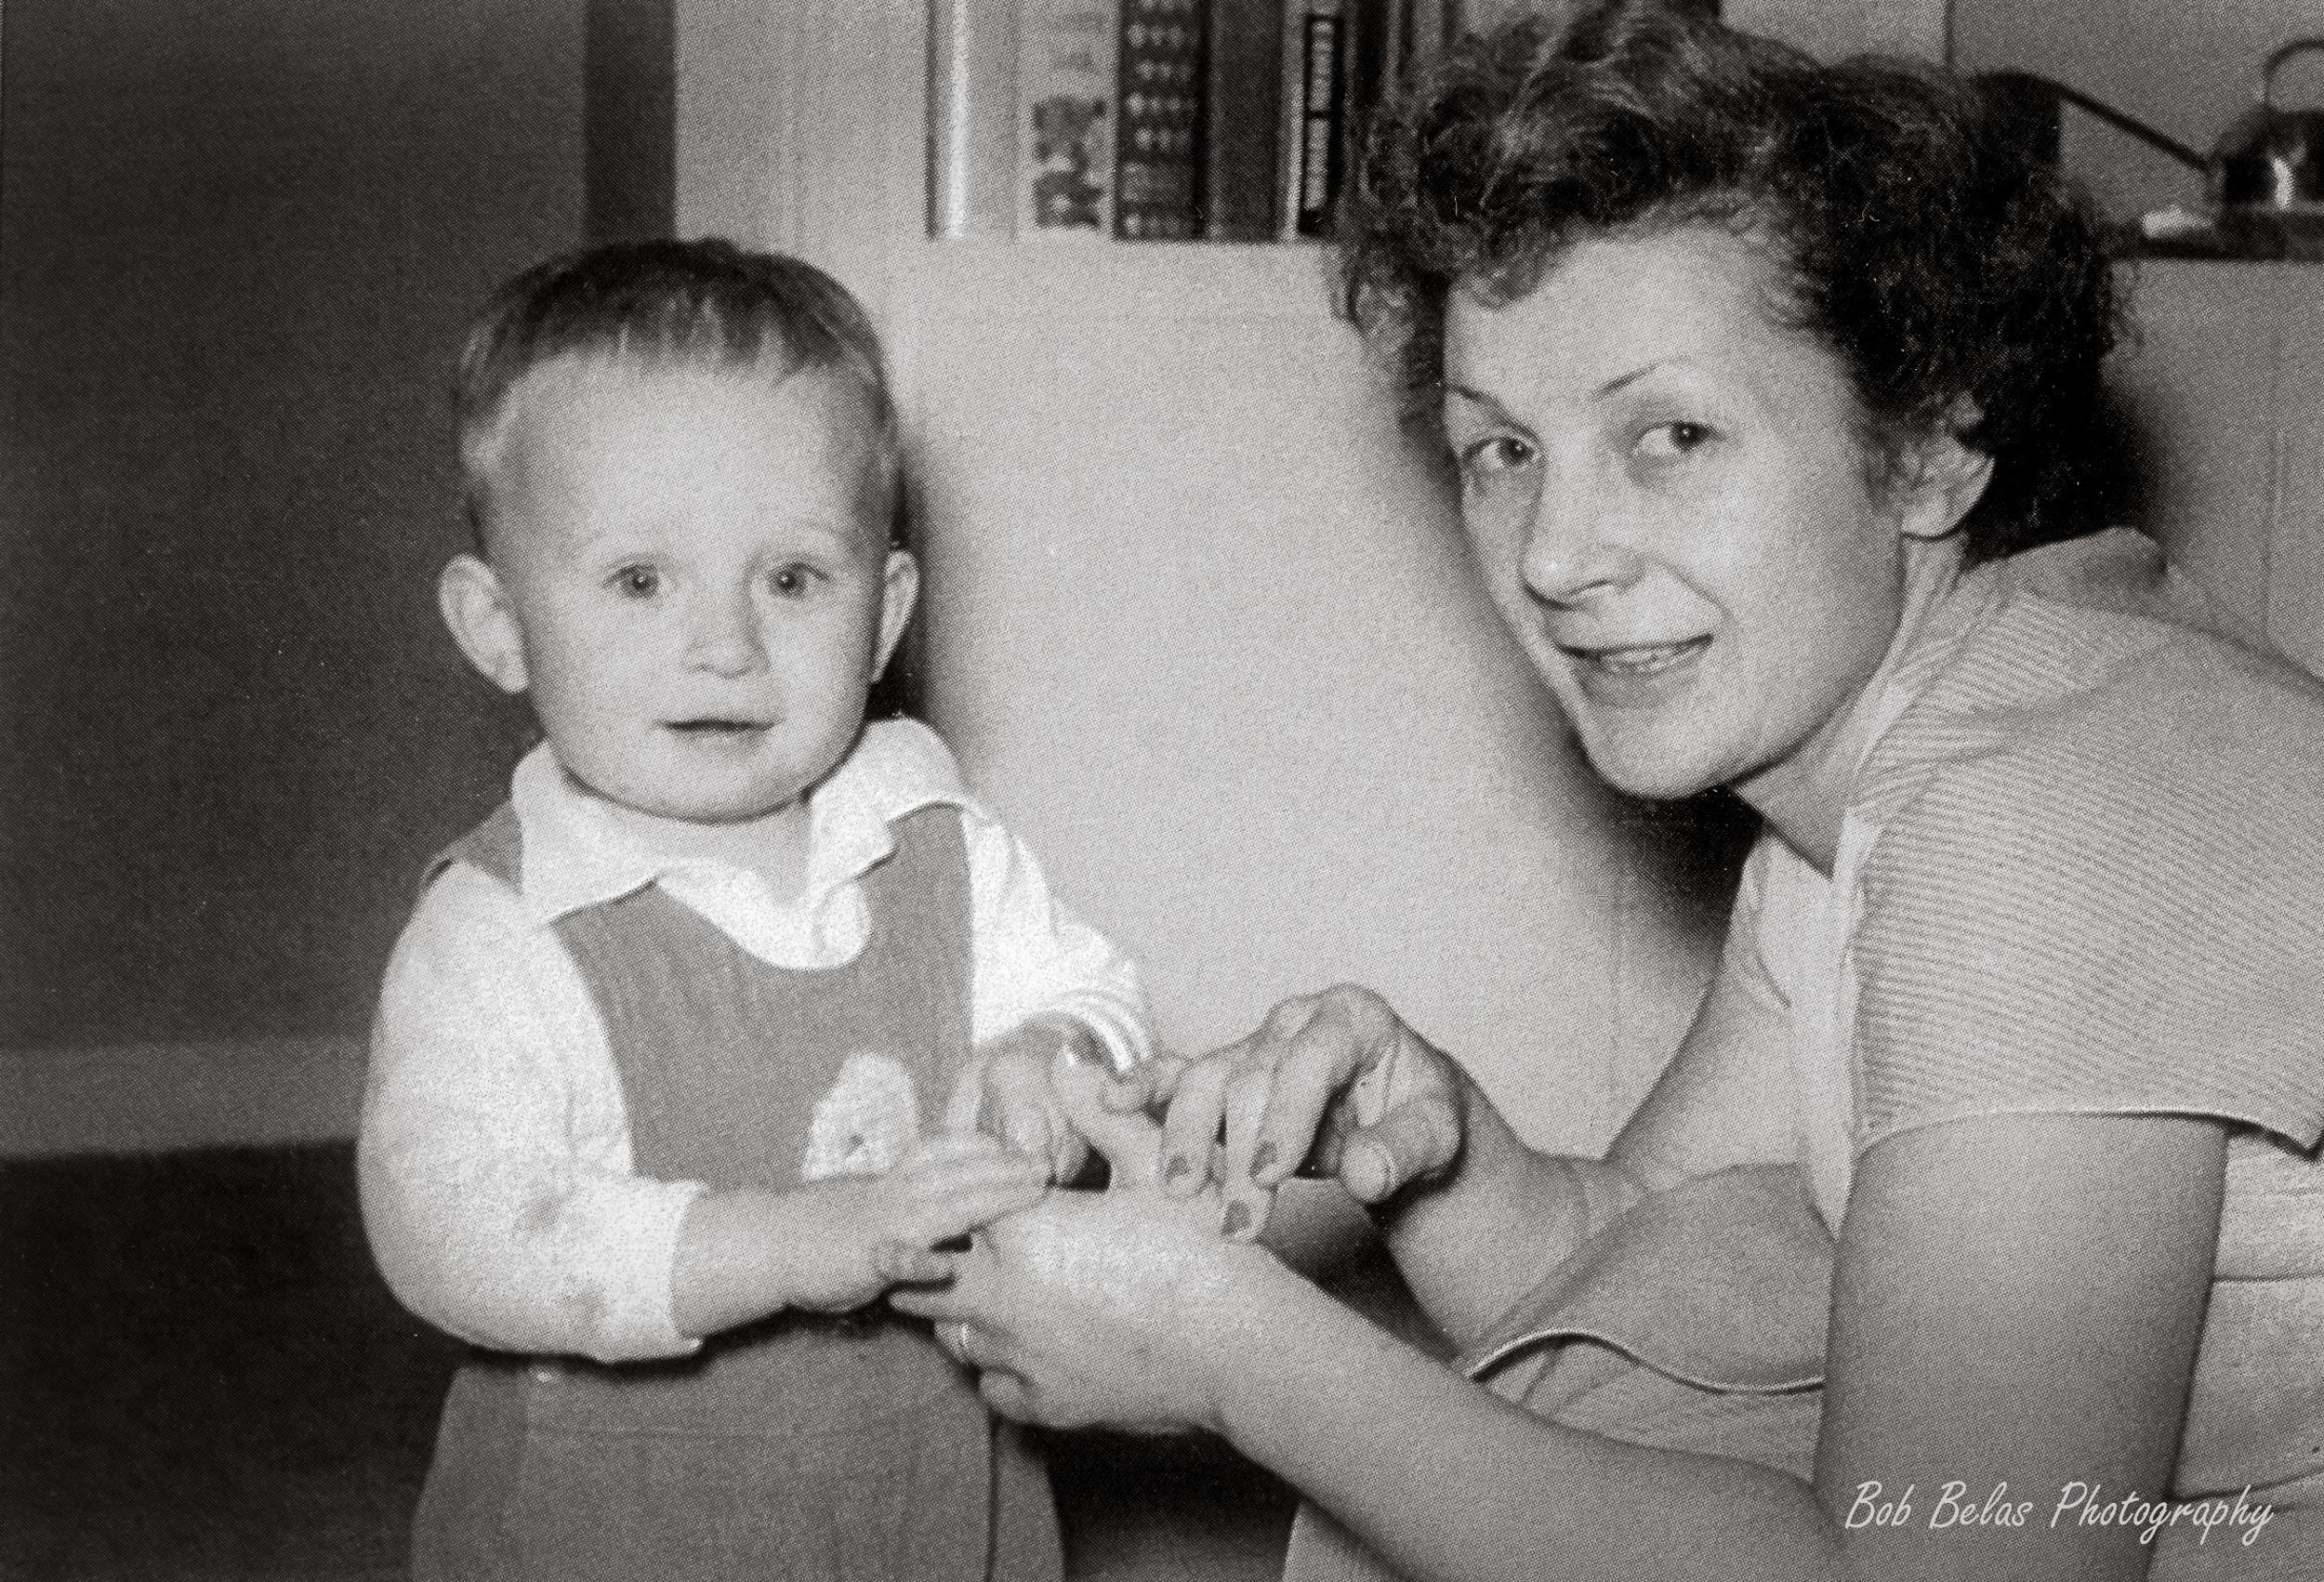 Mom and Bob 1955, monochrome